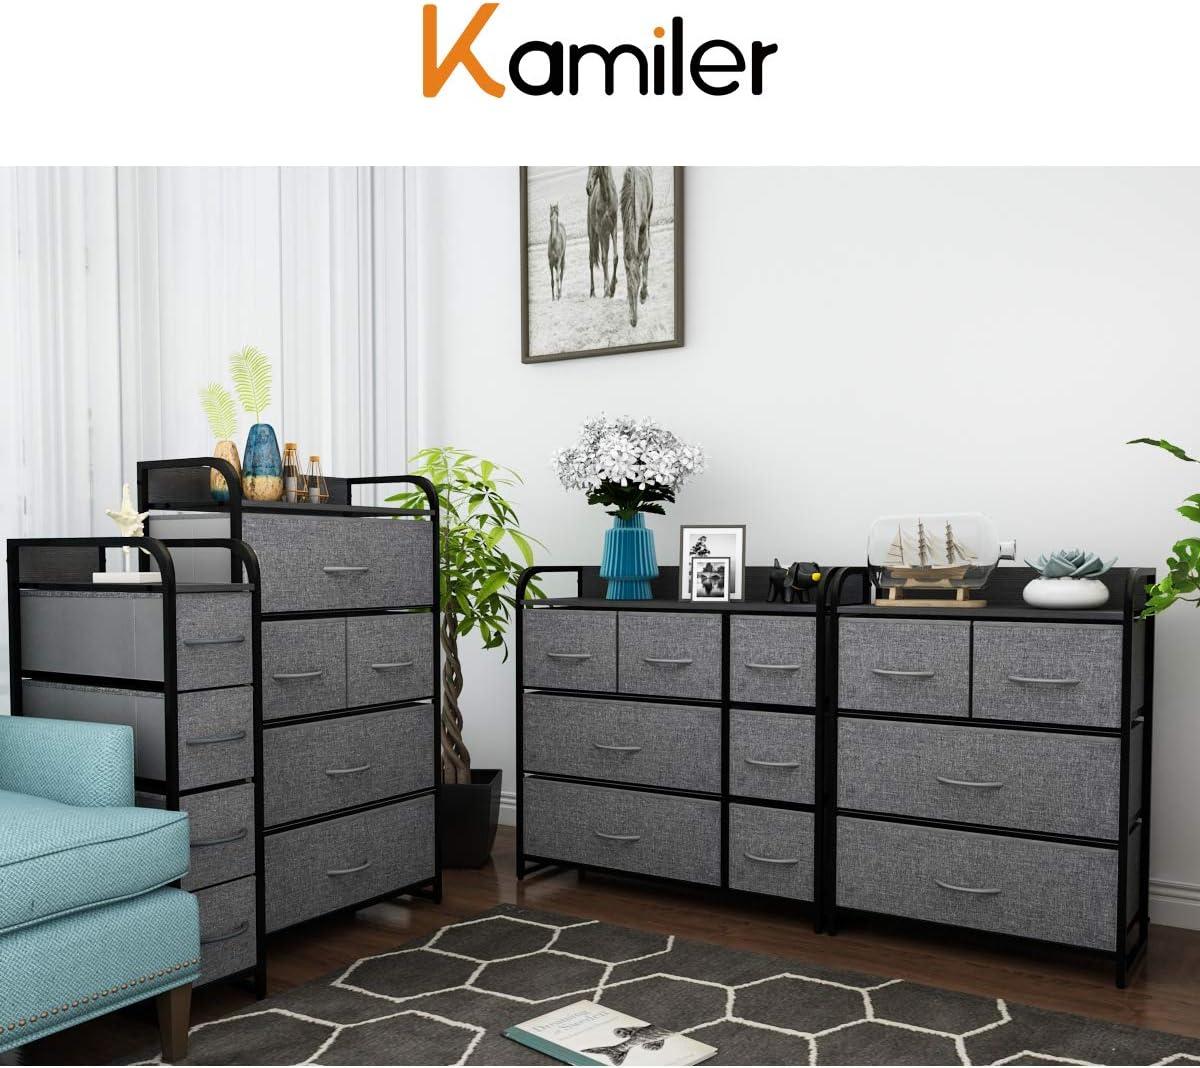 Amazon Com Kamiler 7 Drawer Dresser And 4 Drawer Dresser Set Storage Organizer Tower Unit For Bedroom Closet Hallway Entryway Kitchen Dining